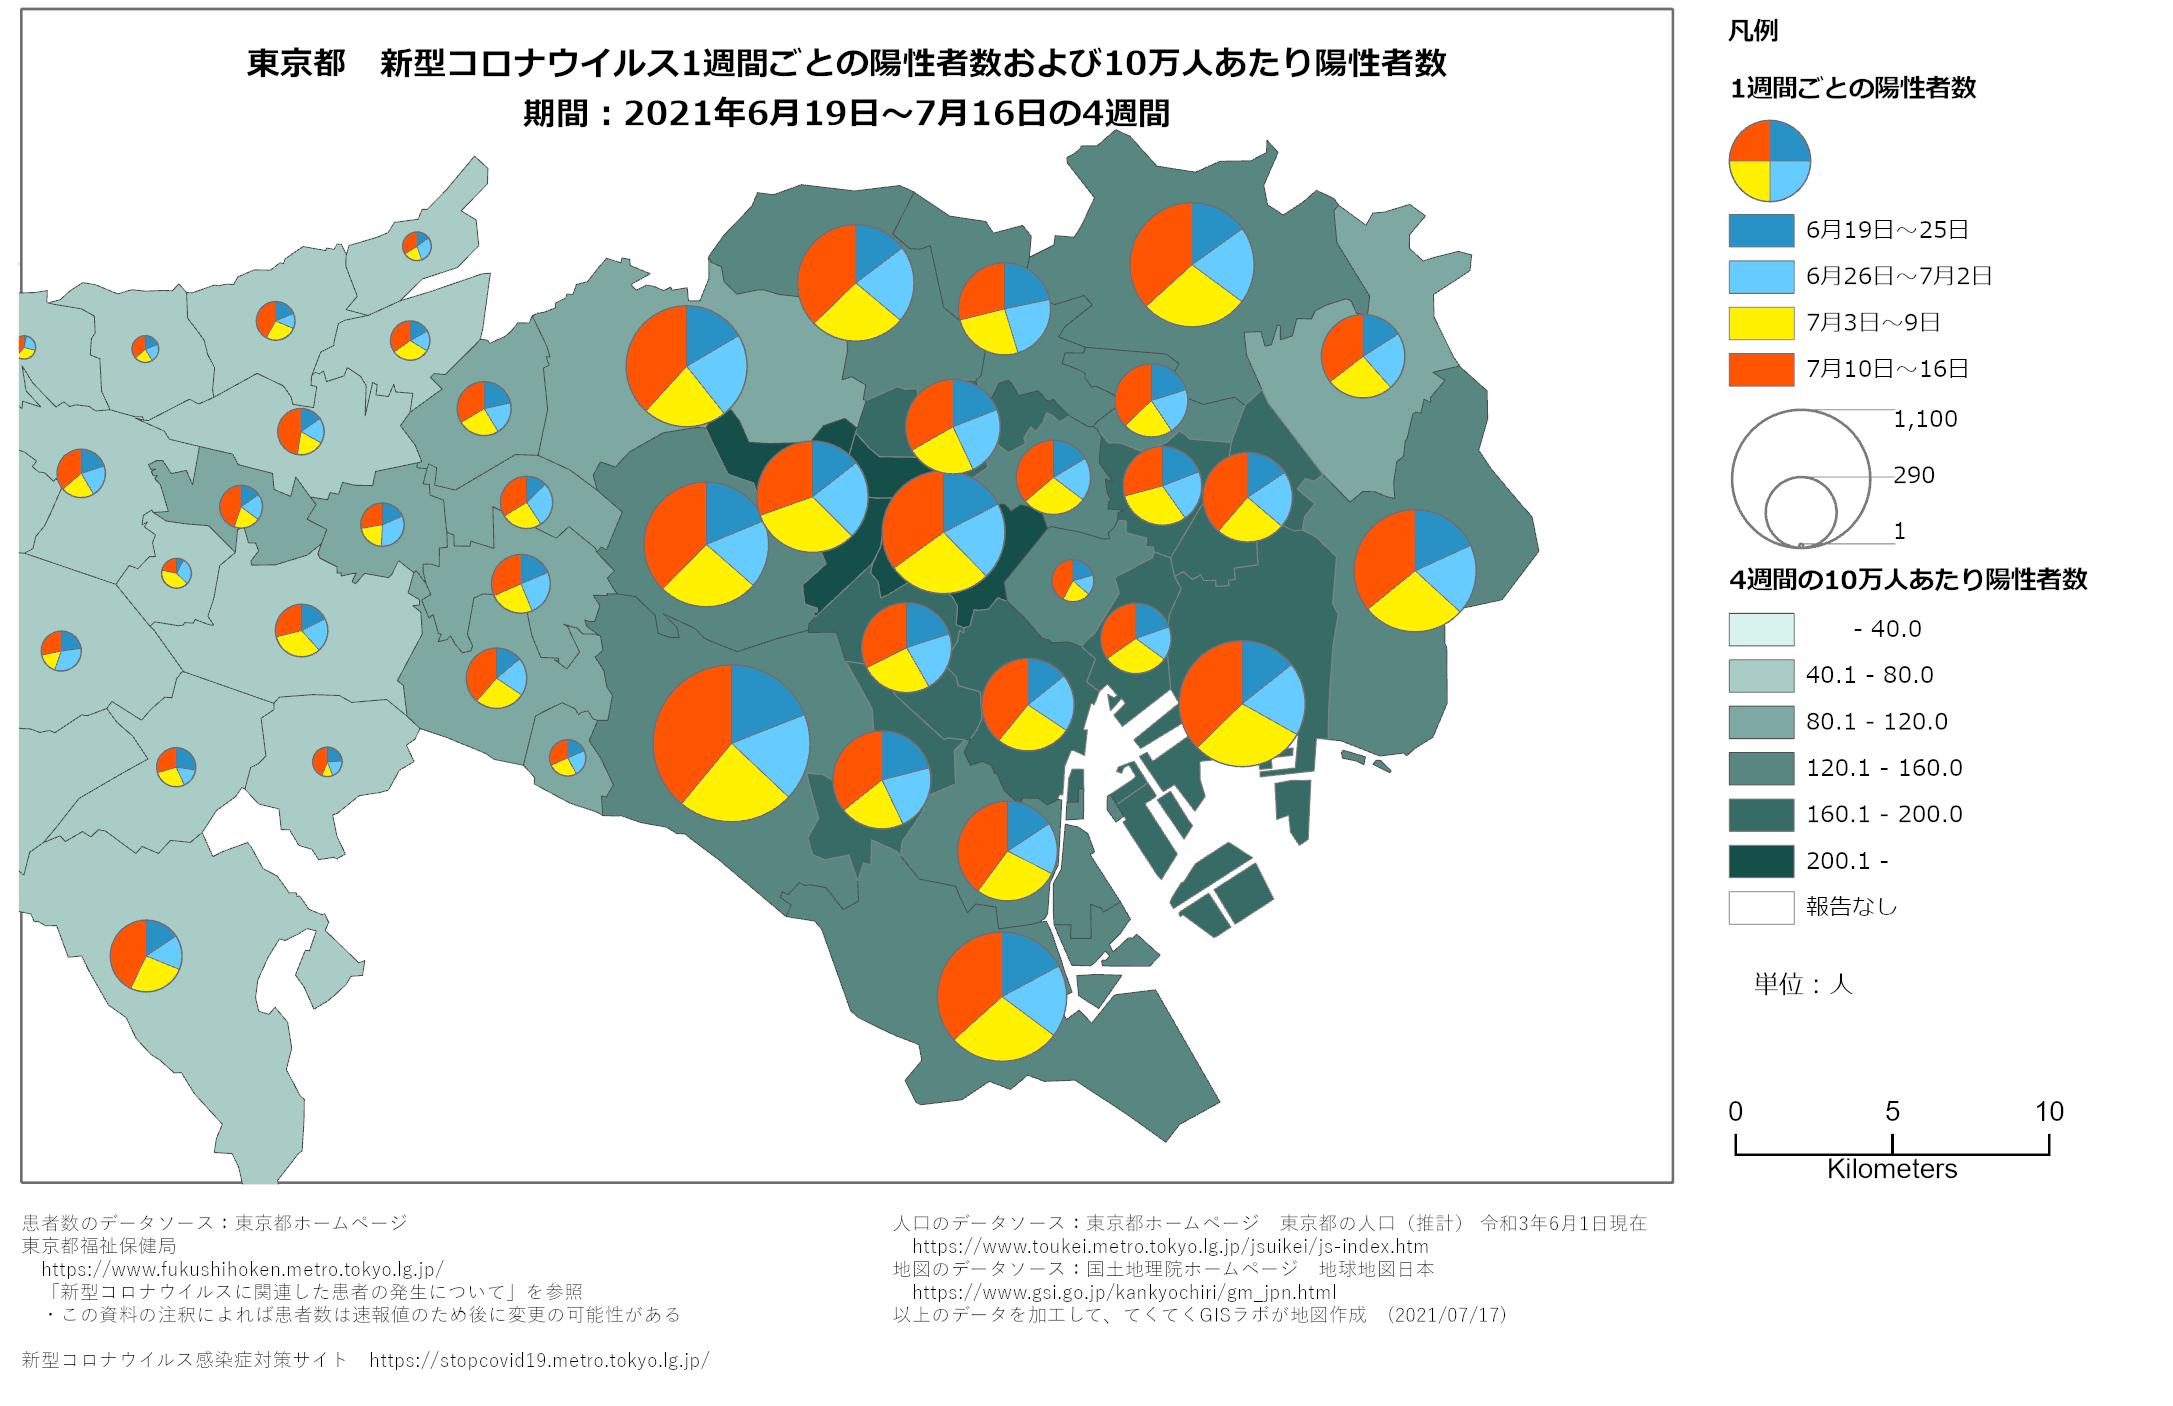 1週間ごと感染者数、東京都、6月19日〜7月16日